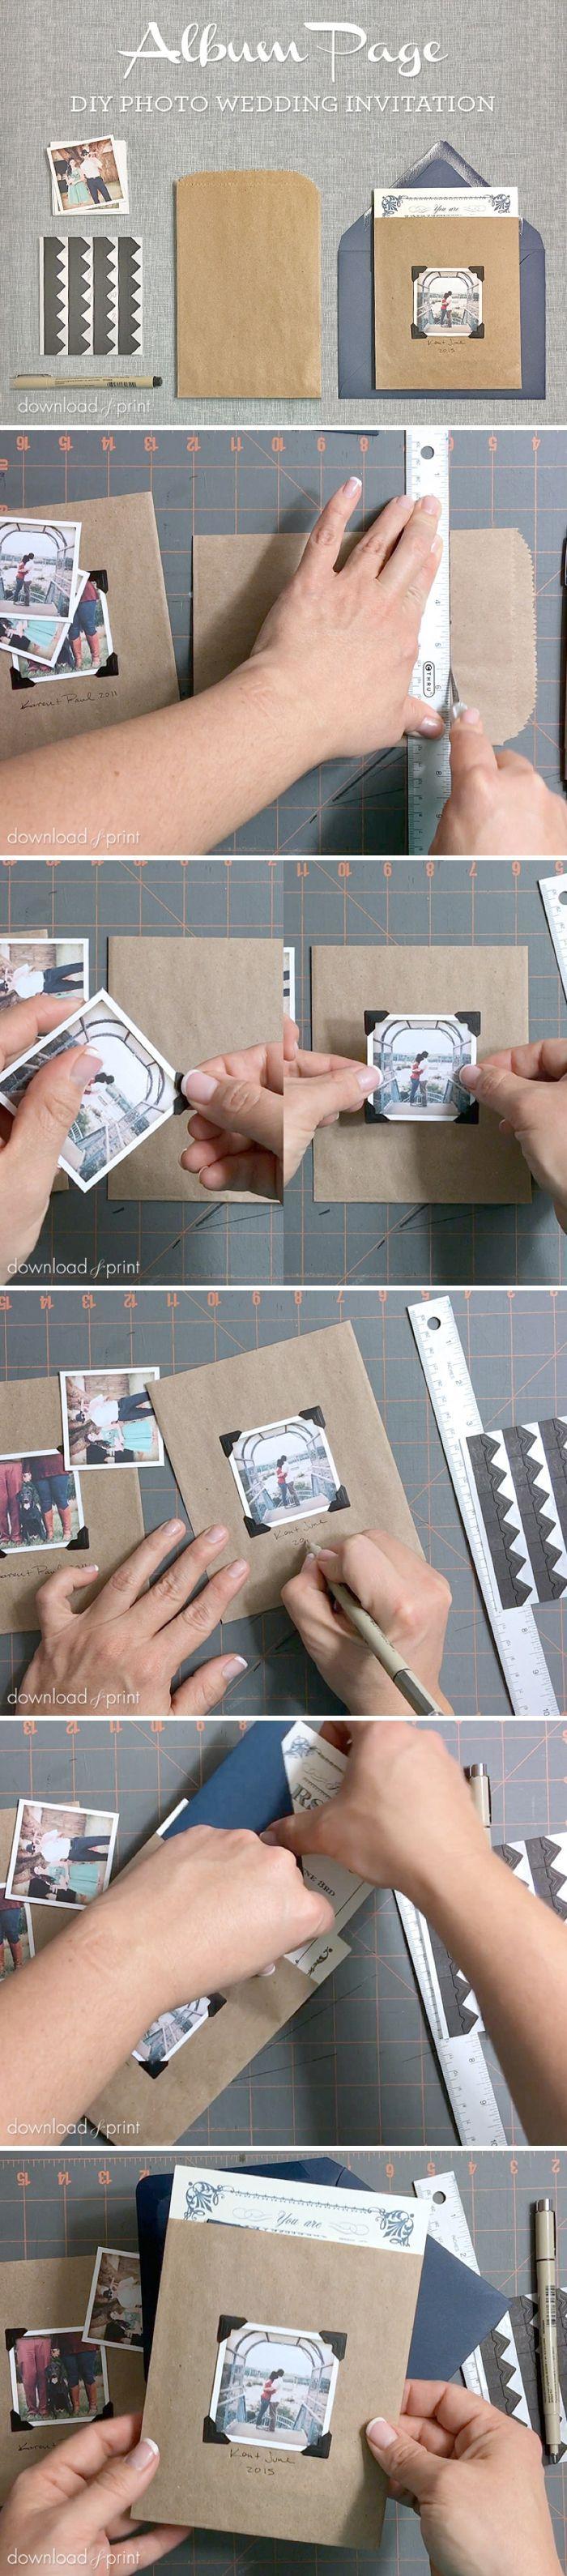 Vintage Photo Album Pocket - DIY Wedding Invitation Embellishment